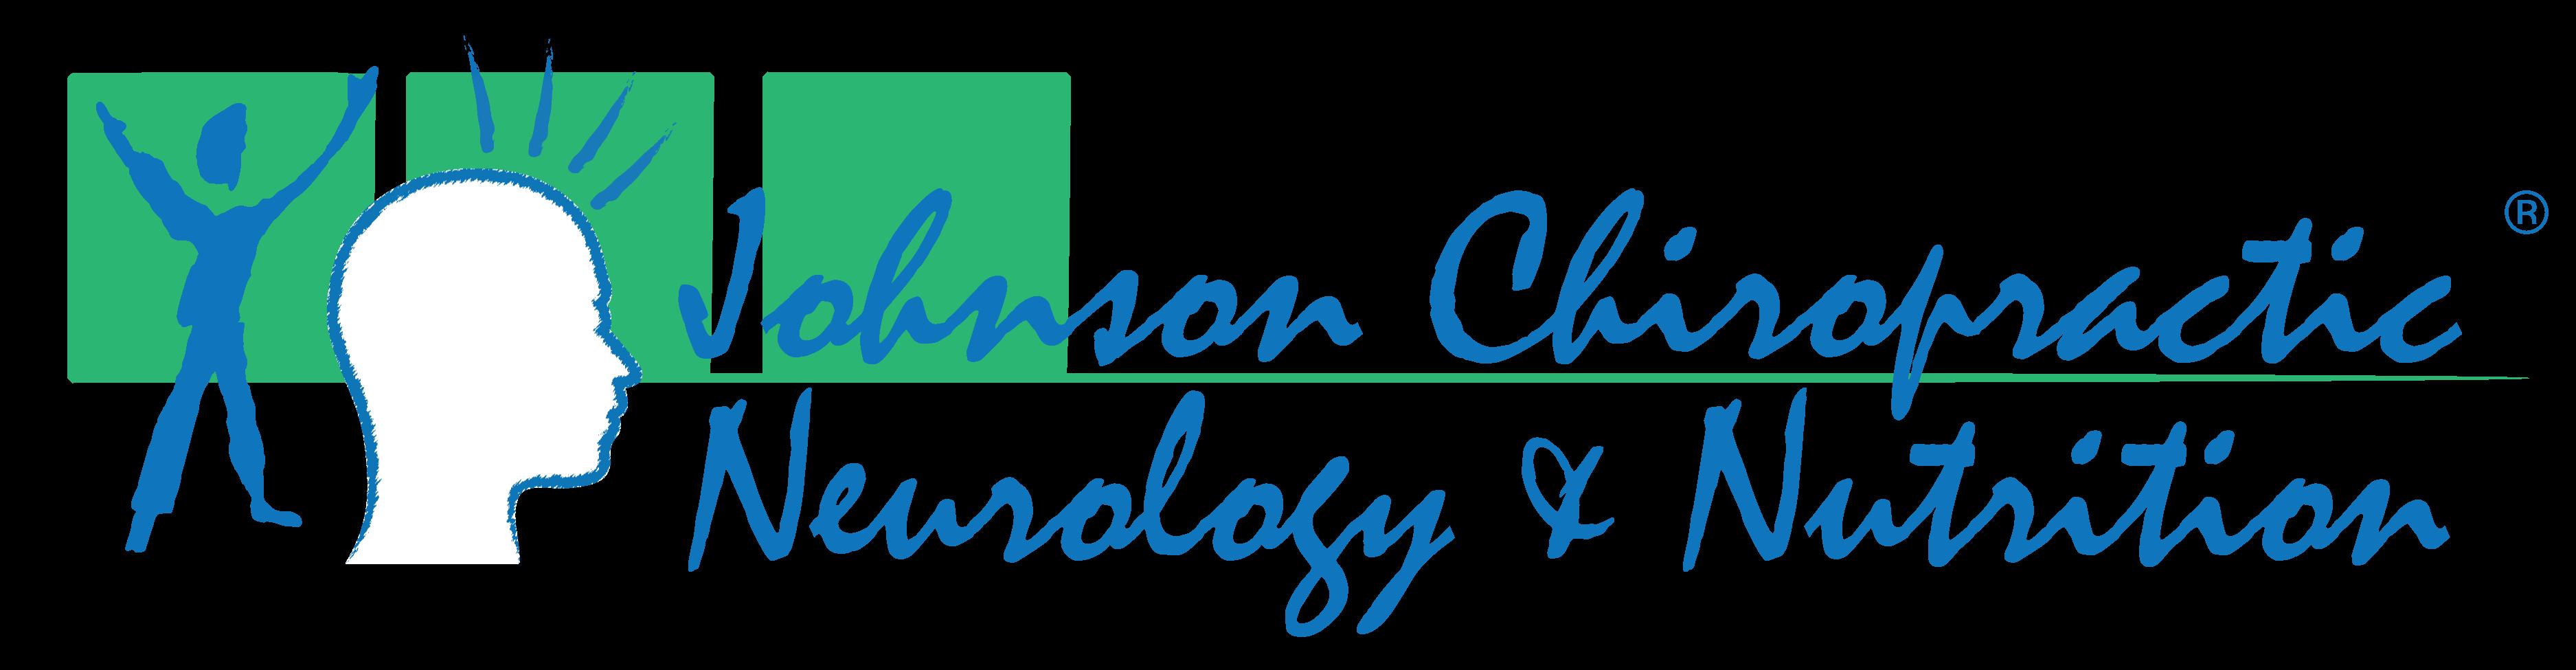 Johnson Chiropractic Neurology